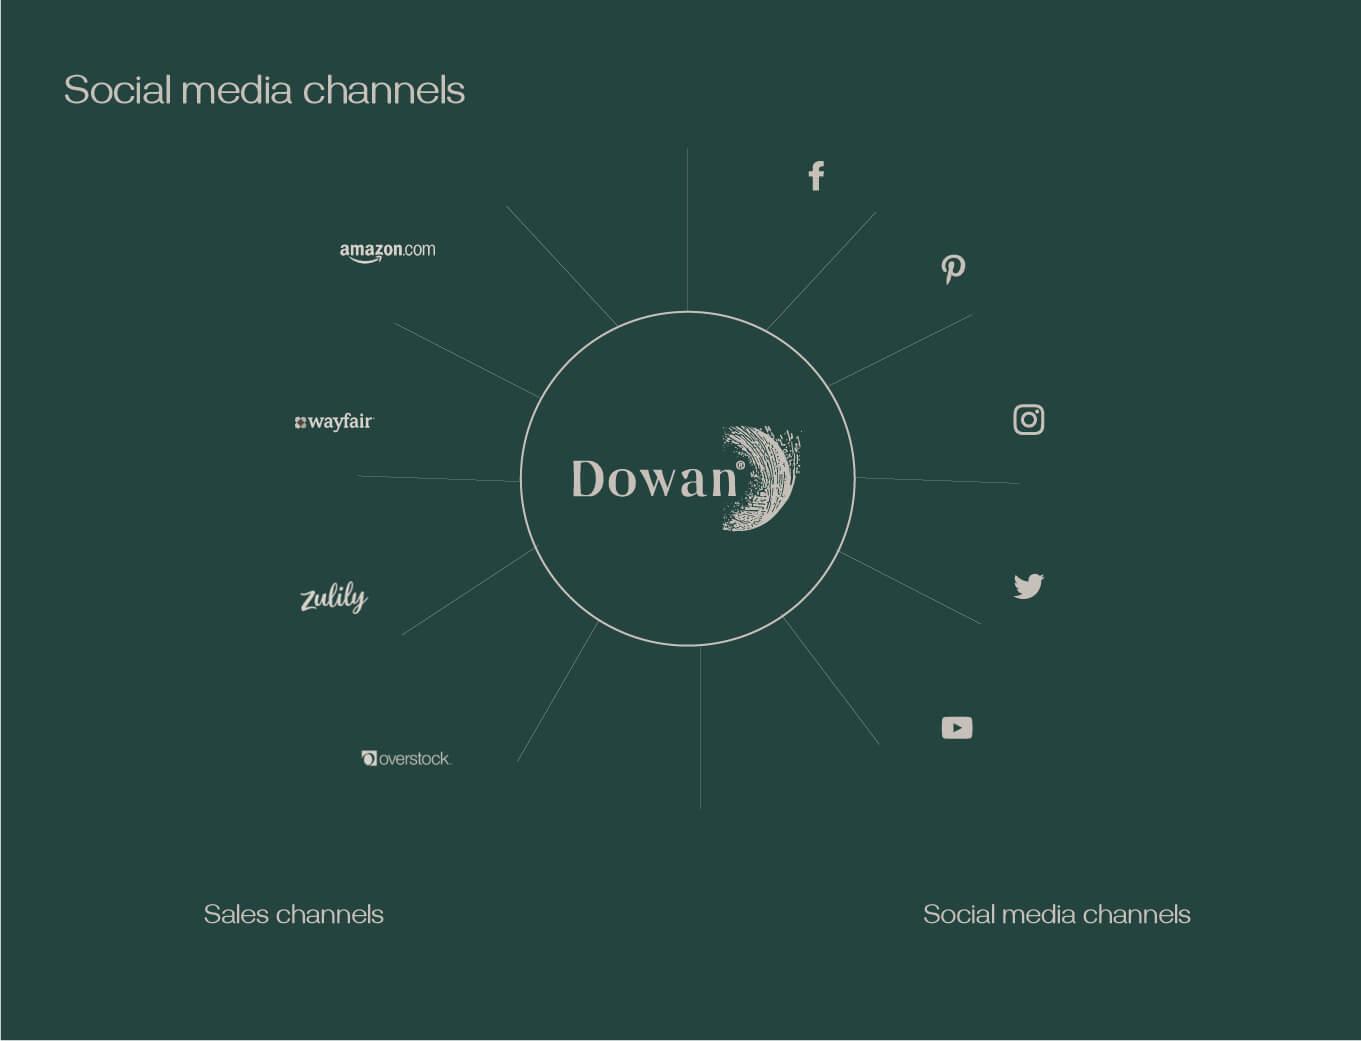 Dowan social media channel chart with big web shops like amazon overstock